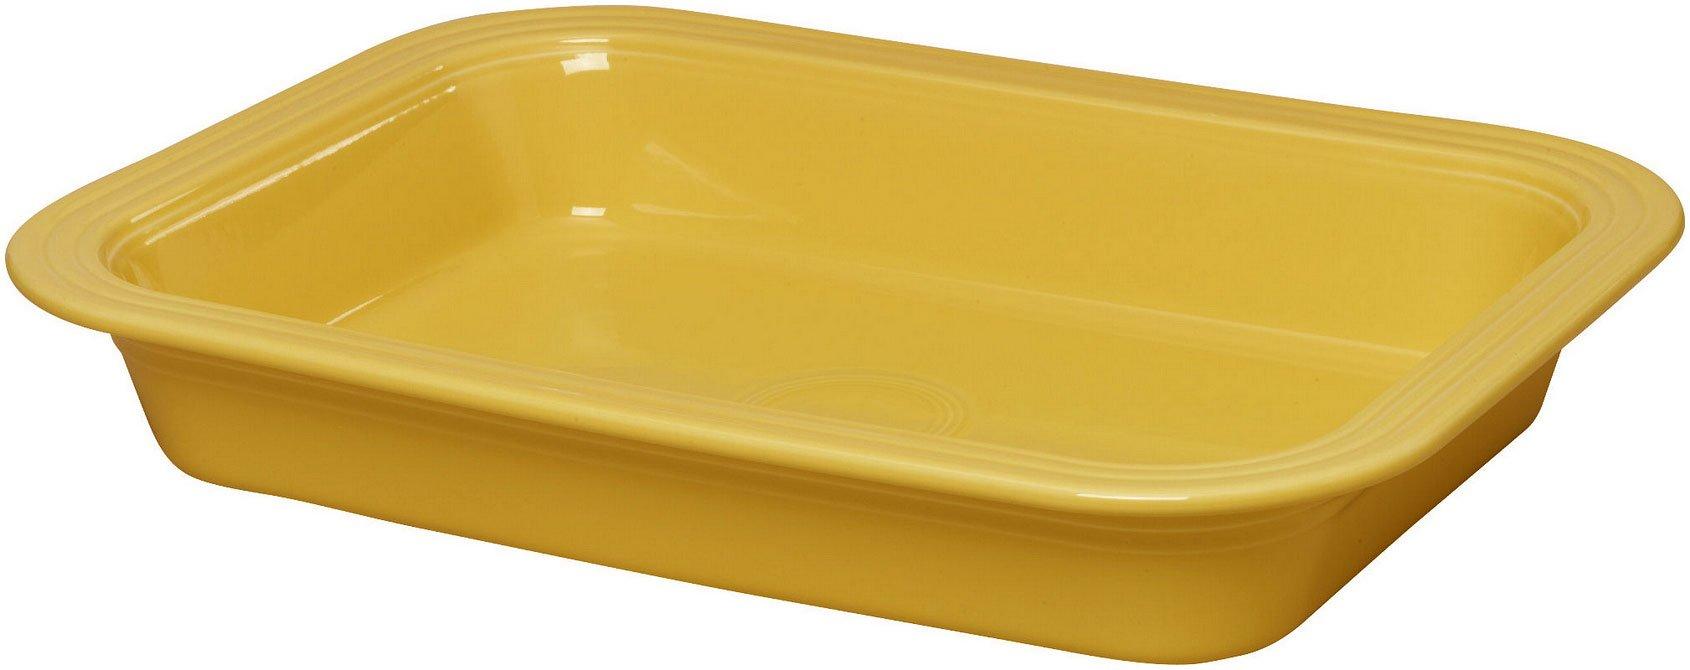 Fiestaware 9'' x 13'' Lasagna Pan (Sunflower Yellow)